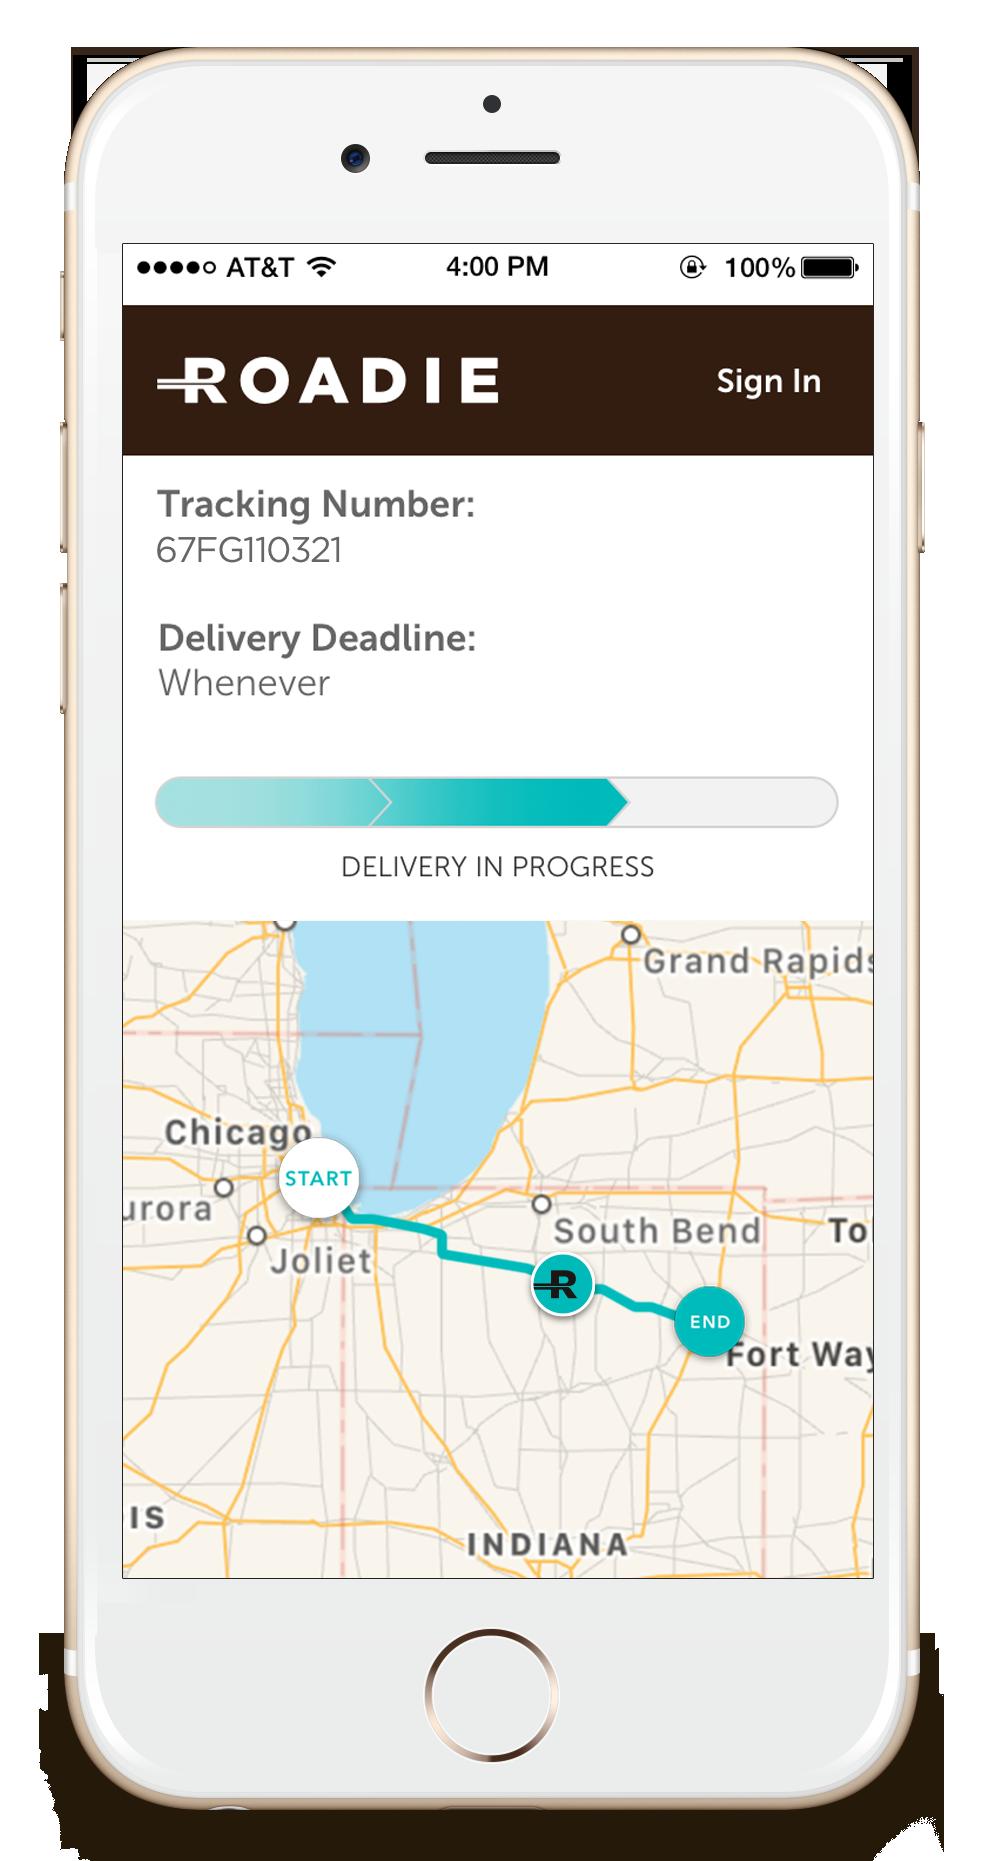 Roadie-App_Live-Tracking.png